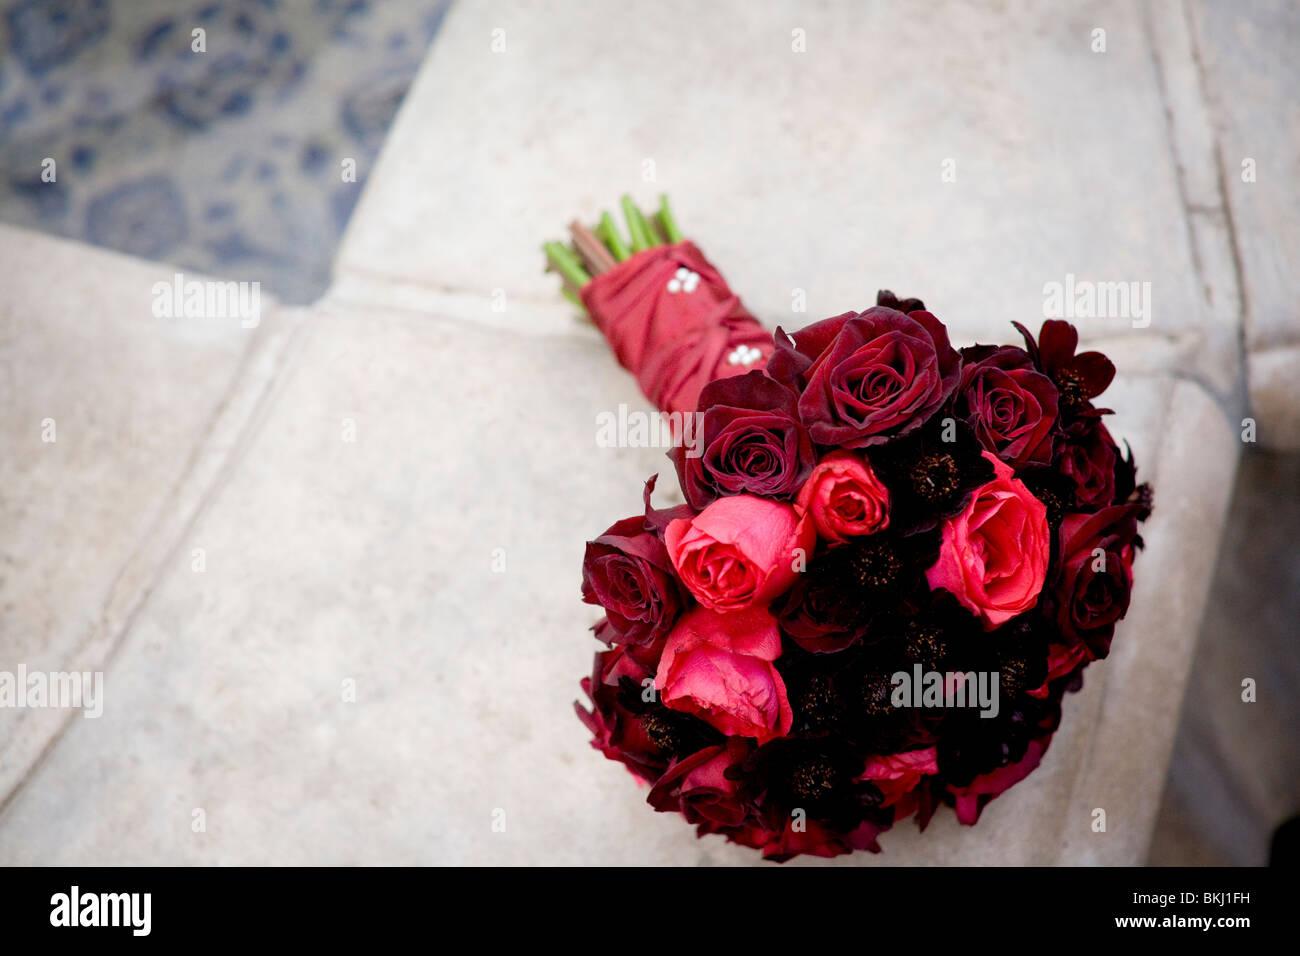 Red Rose Imágenes De Stock & Red Rose Fotos De Stock - Alamy